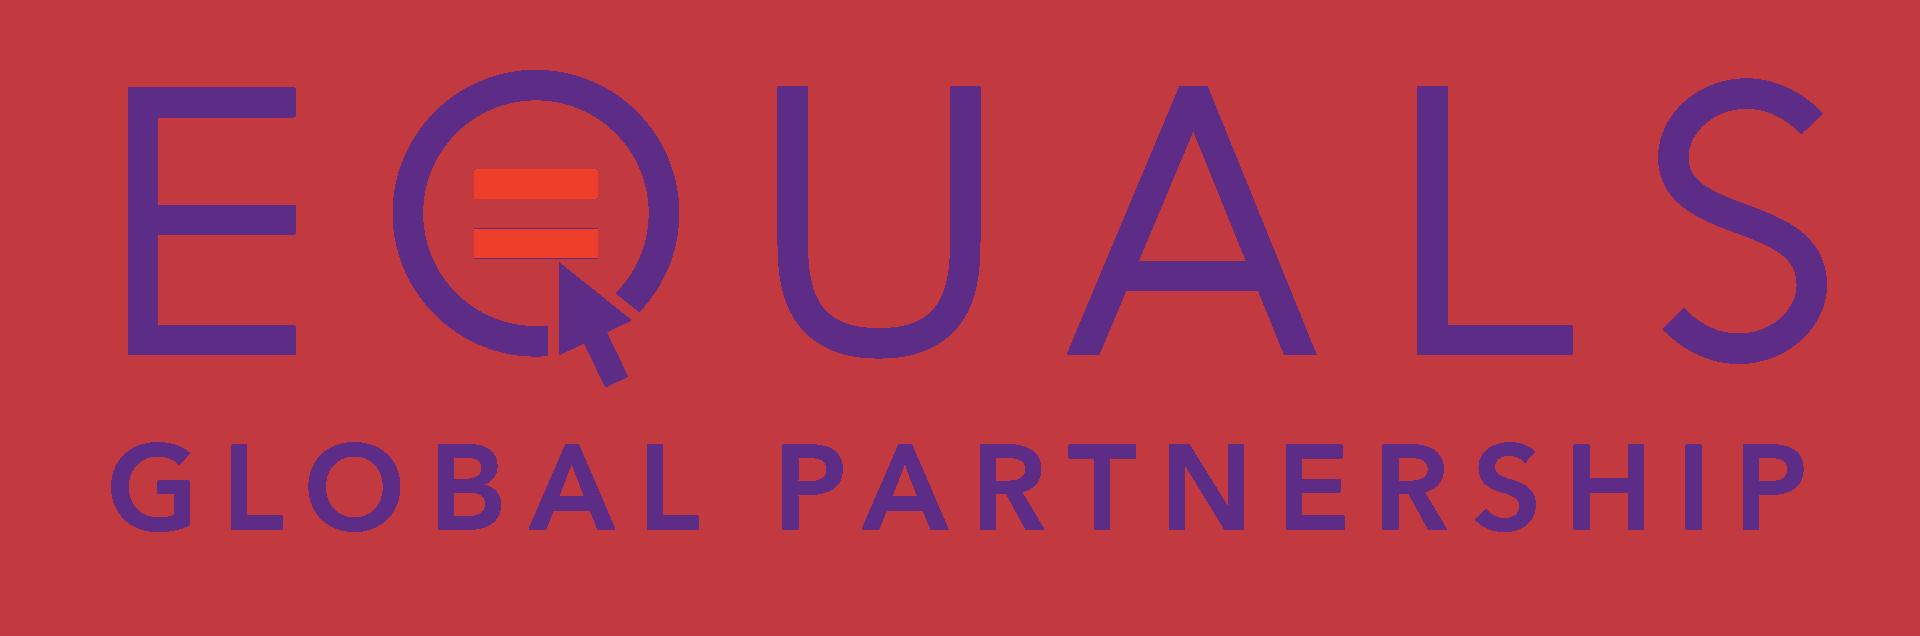 equals-global-partnership-logo-1